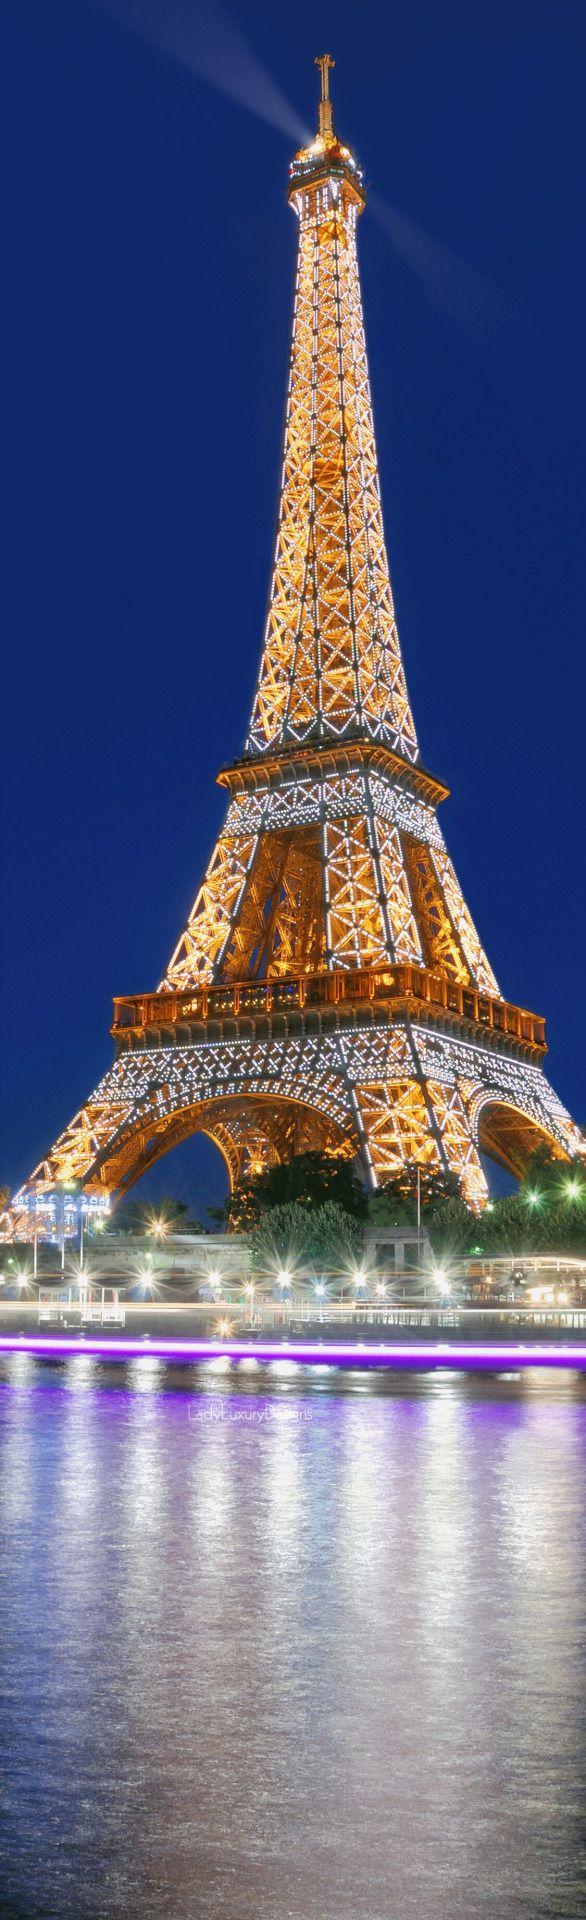 Eiffel Tower                                                                                                                                                     Mais